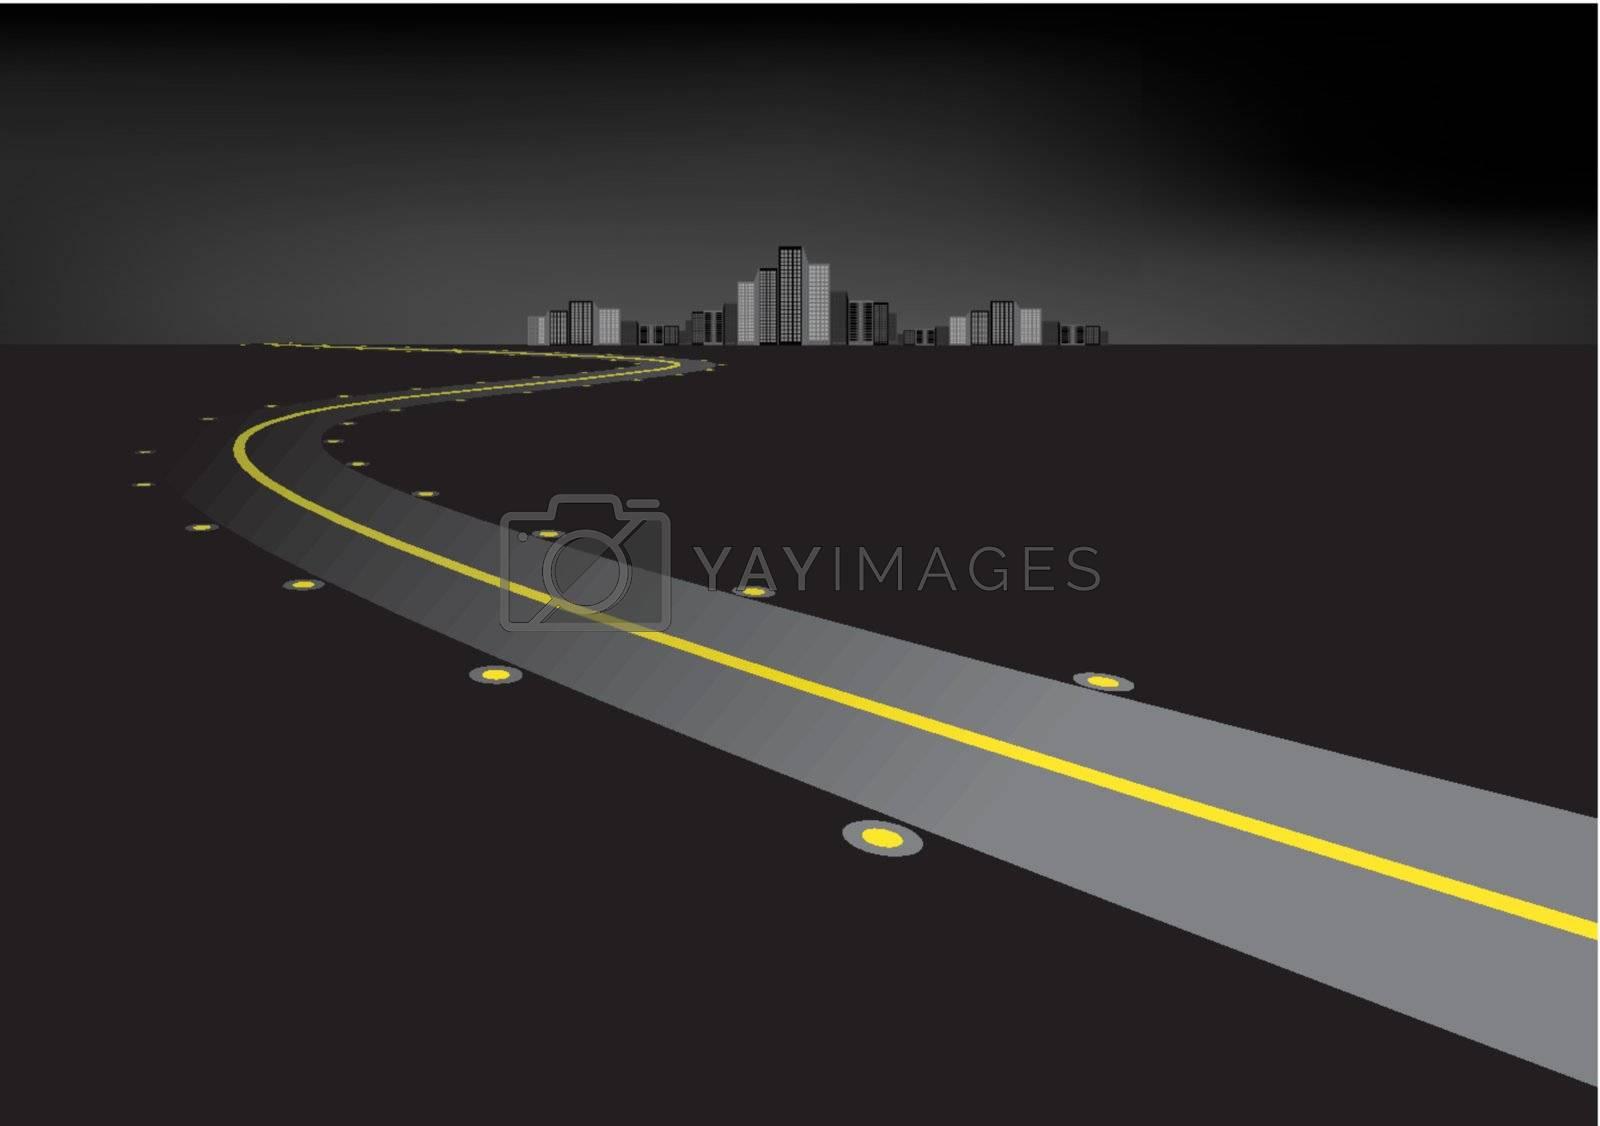 Road in the night illustartion